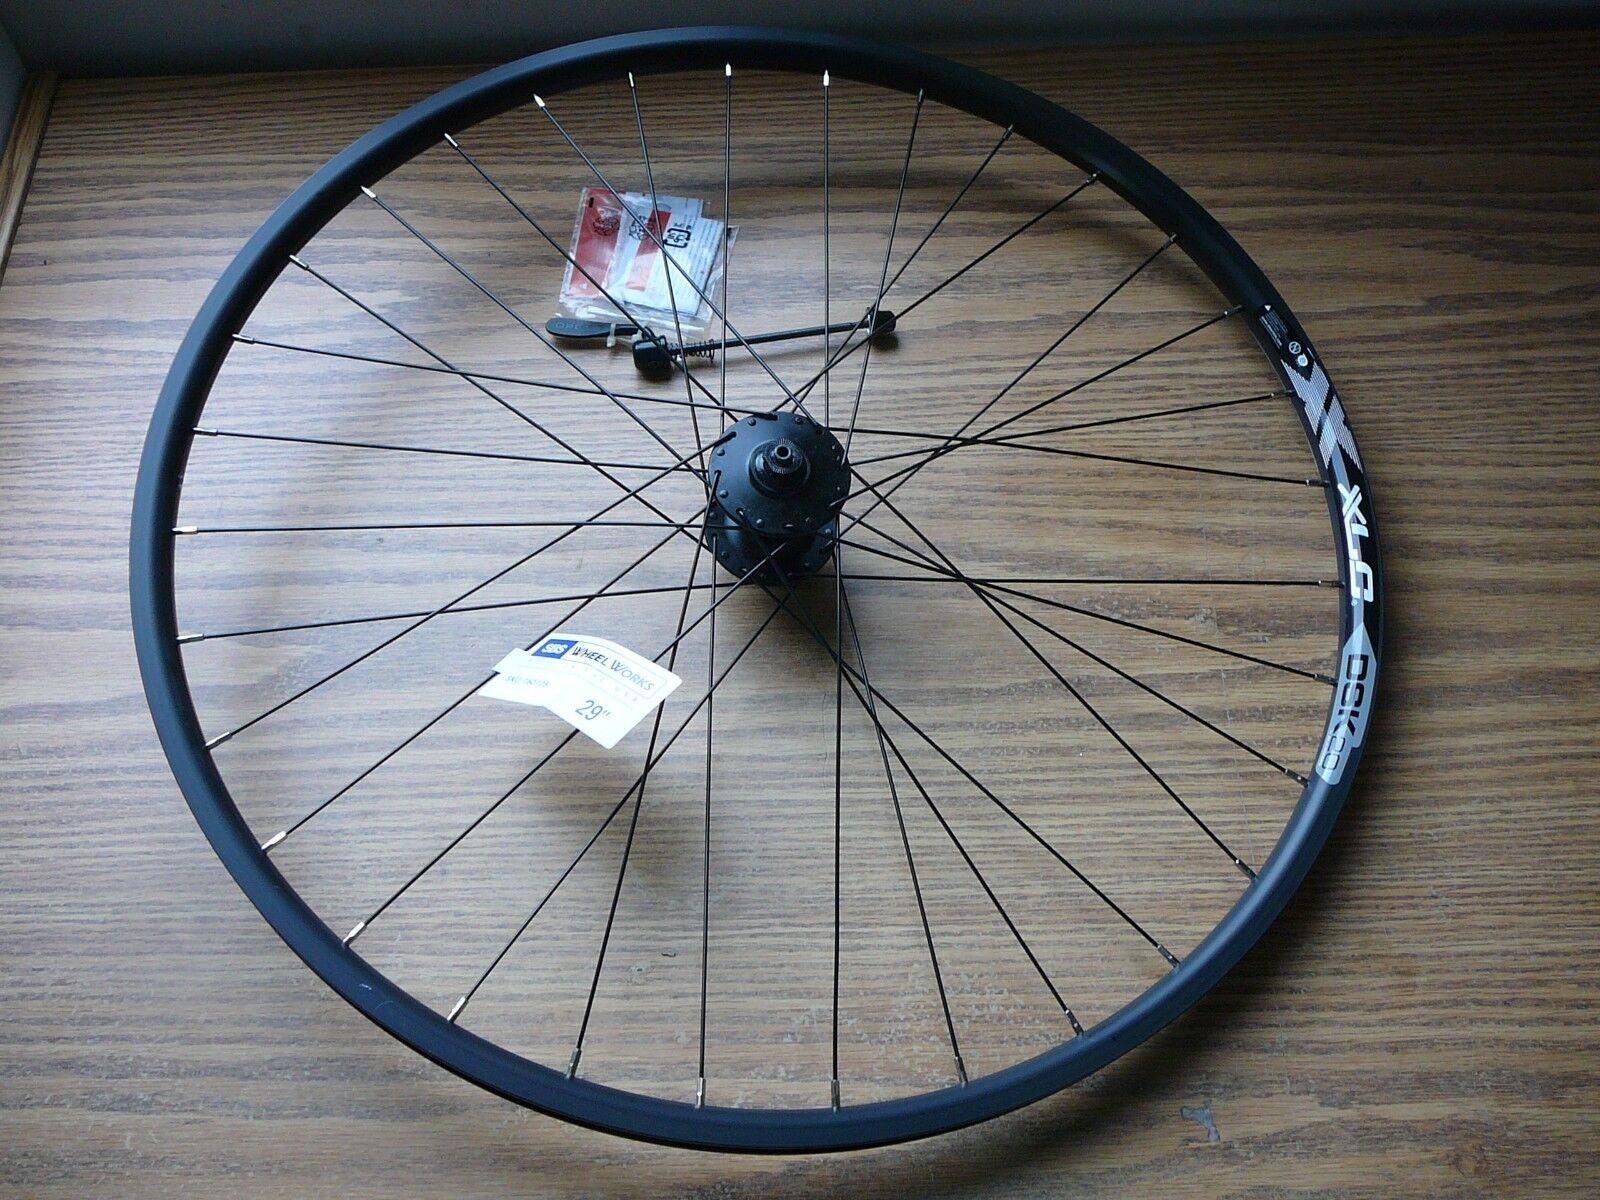 29  MTB Front Bicycle Wheel XLC DSK20 Shimano M475 Disc Brake QR 29er Bike New